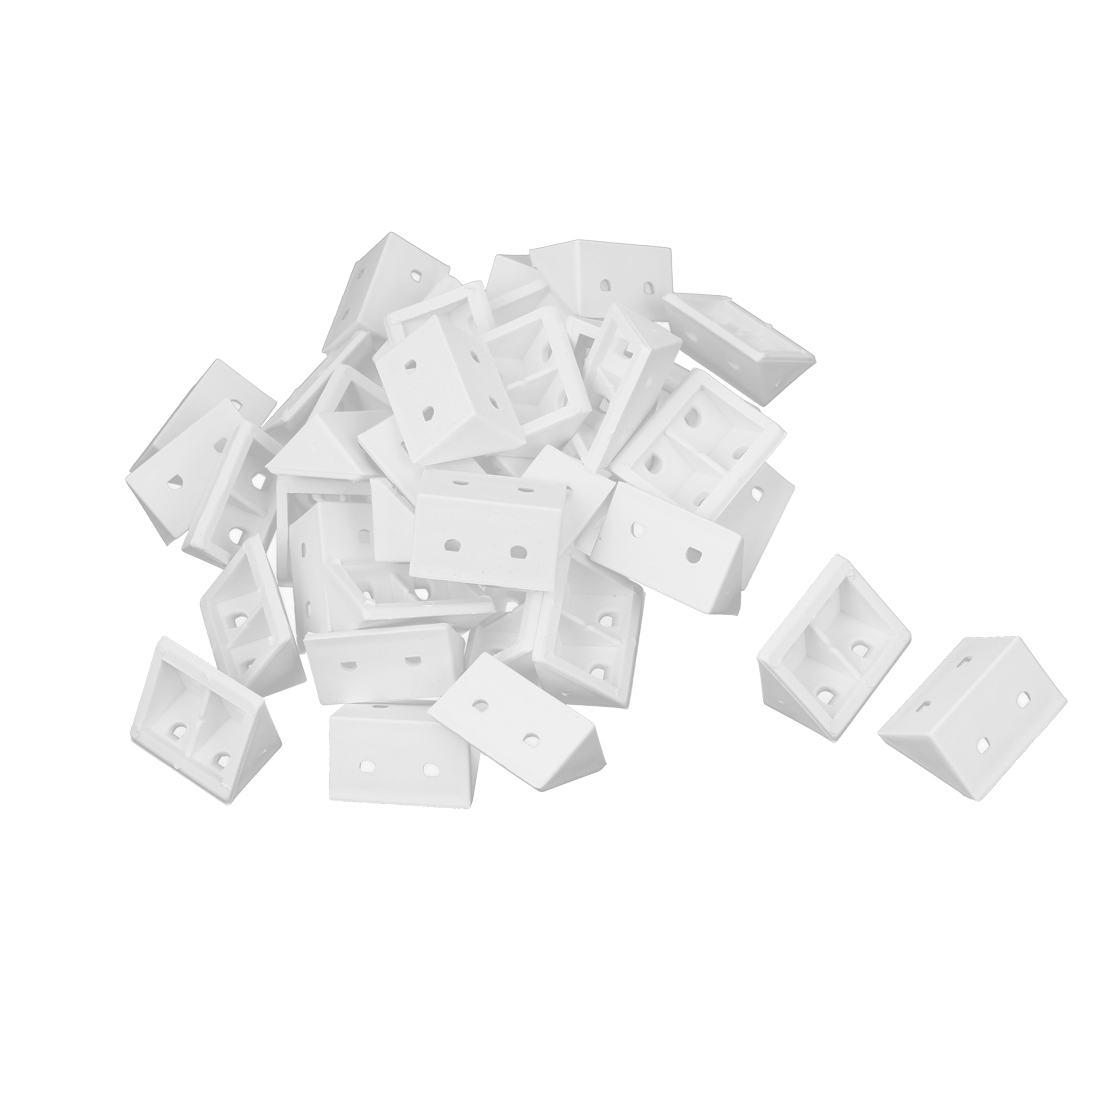 Plastic Shelf Door Cabinet Right Angle Corner Brace Bracket White 40 Pcs